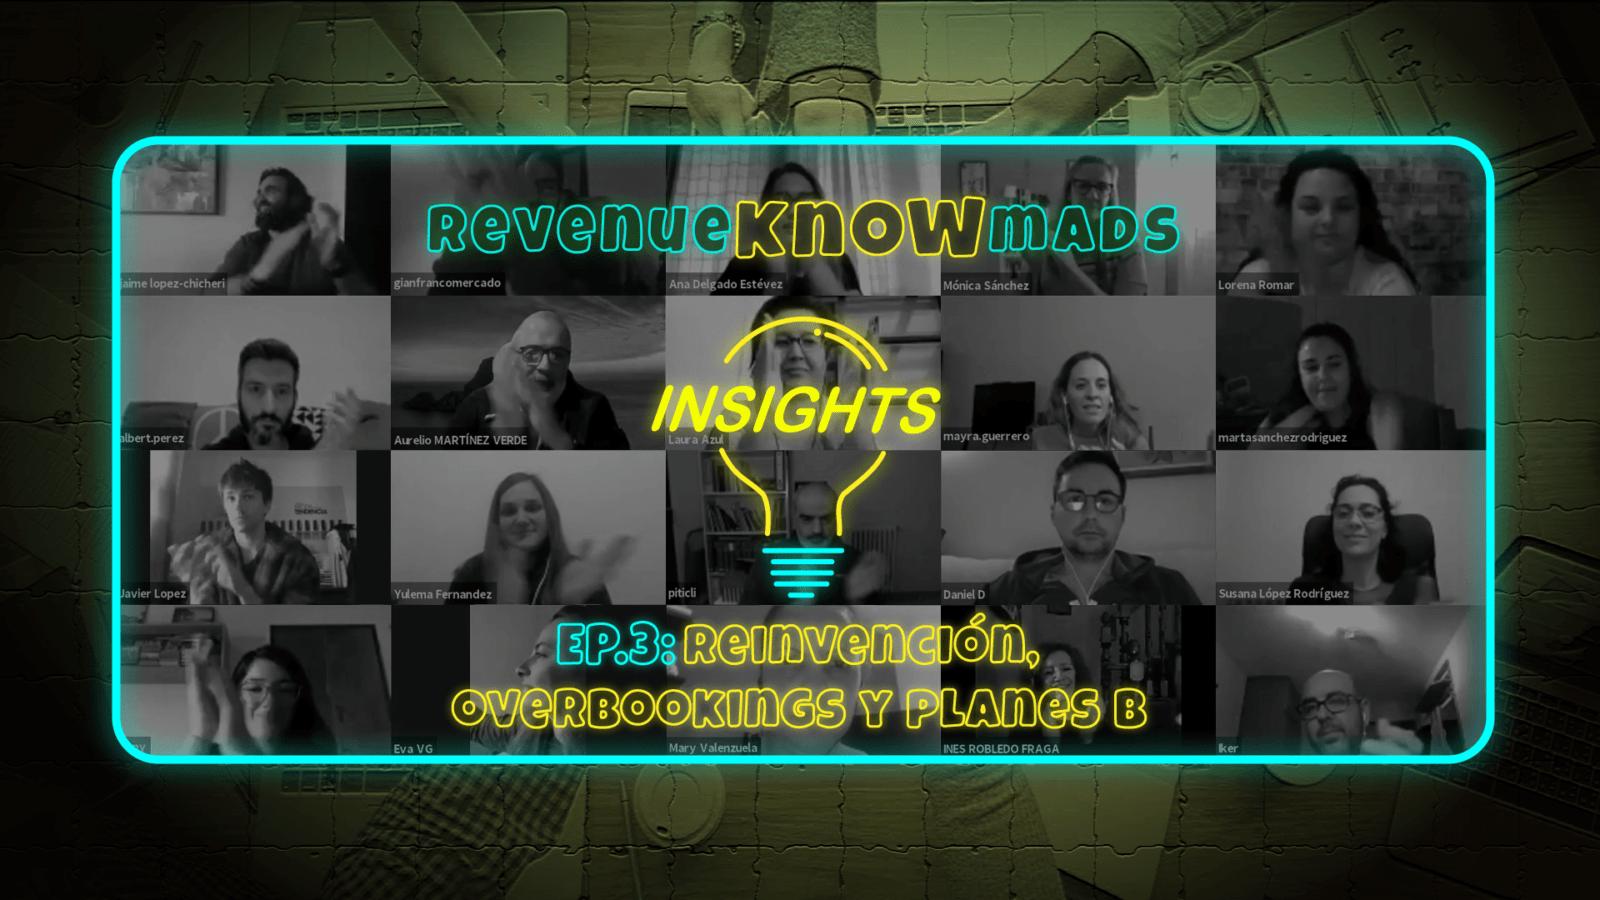 RevenueKnowmads Insights - Ep.3